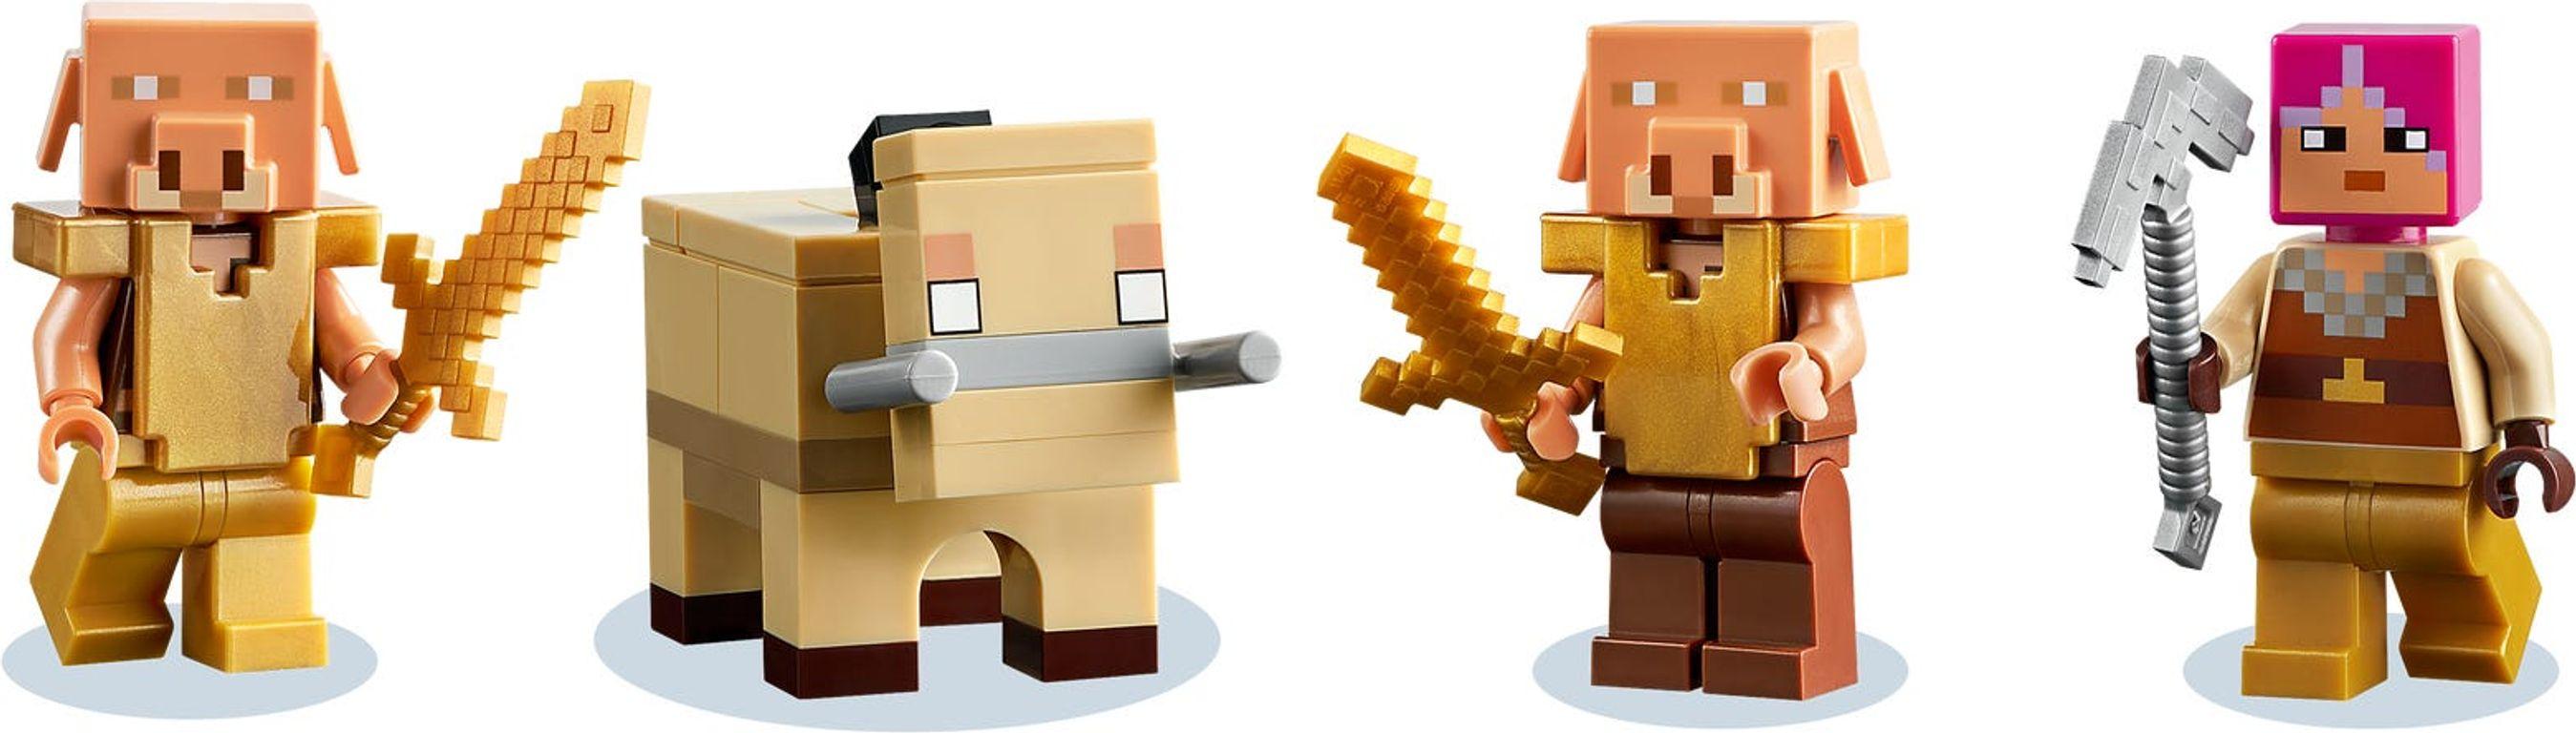 LEGO® Minecraft The Warped Forest minifigures